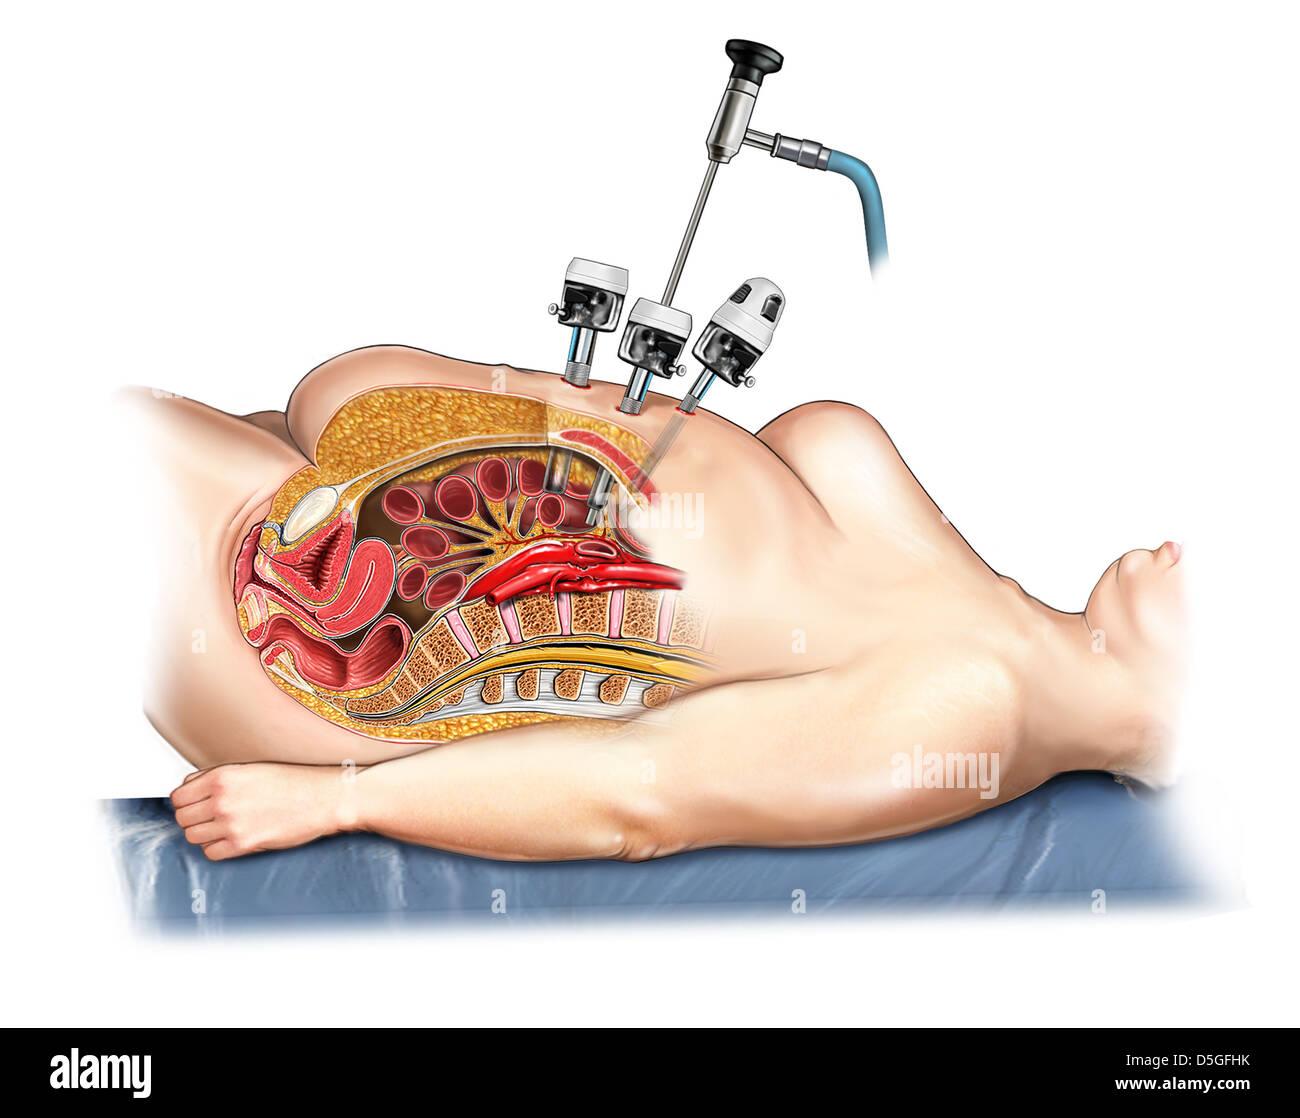 Laparoscopic Surgery - Trocar Insertion Stock Photo, Royalty Free ...